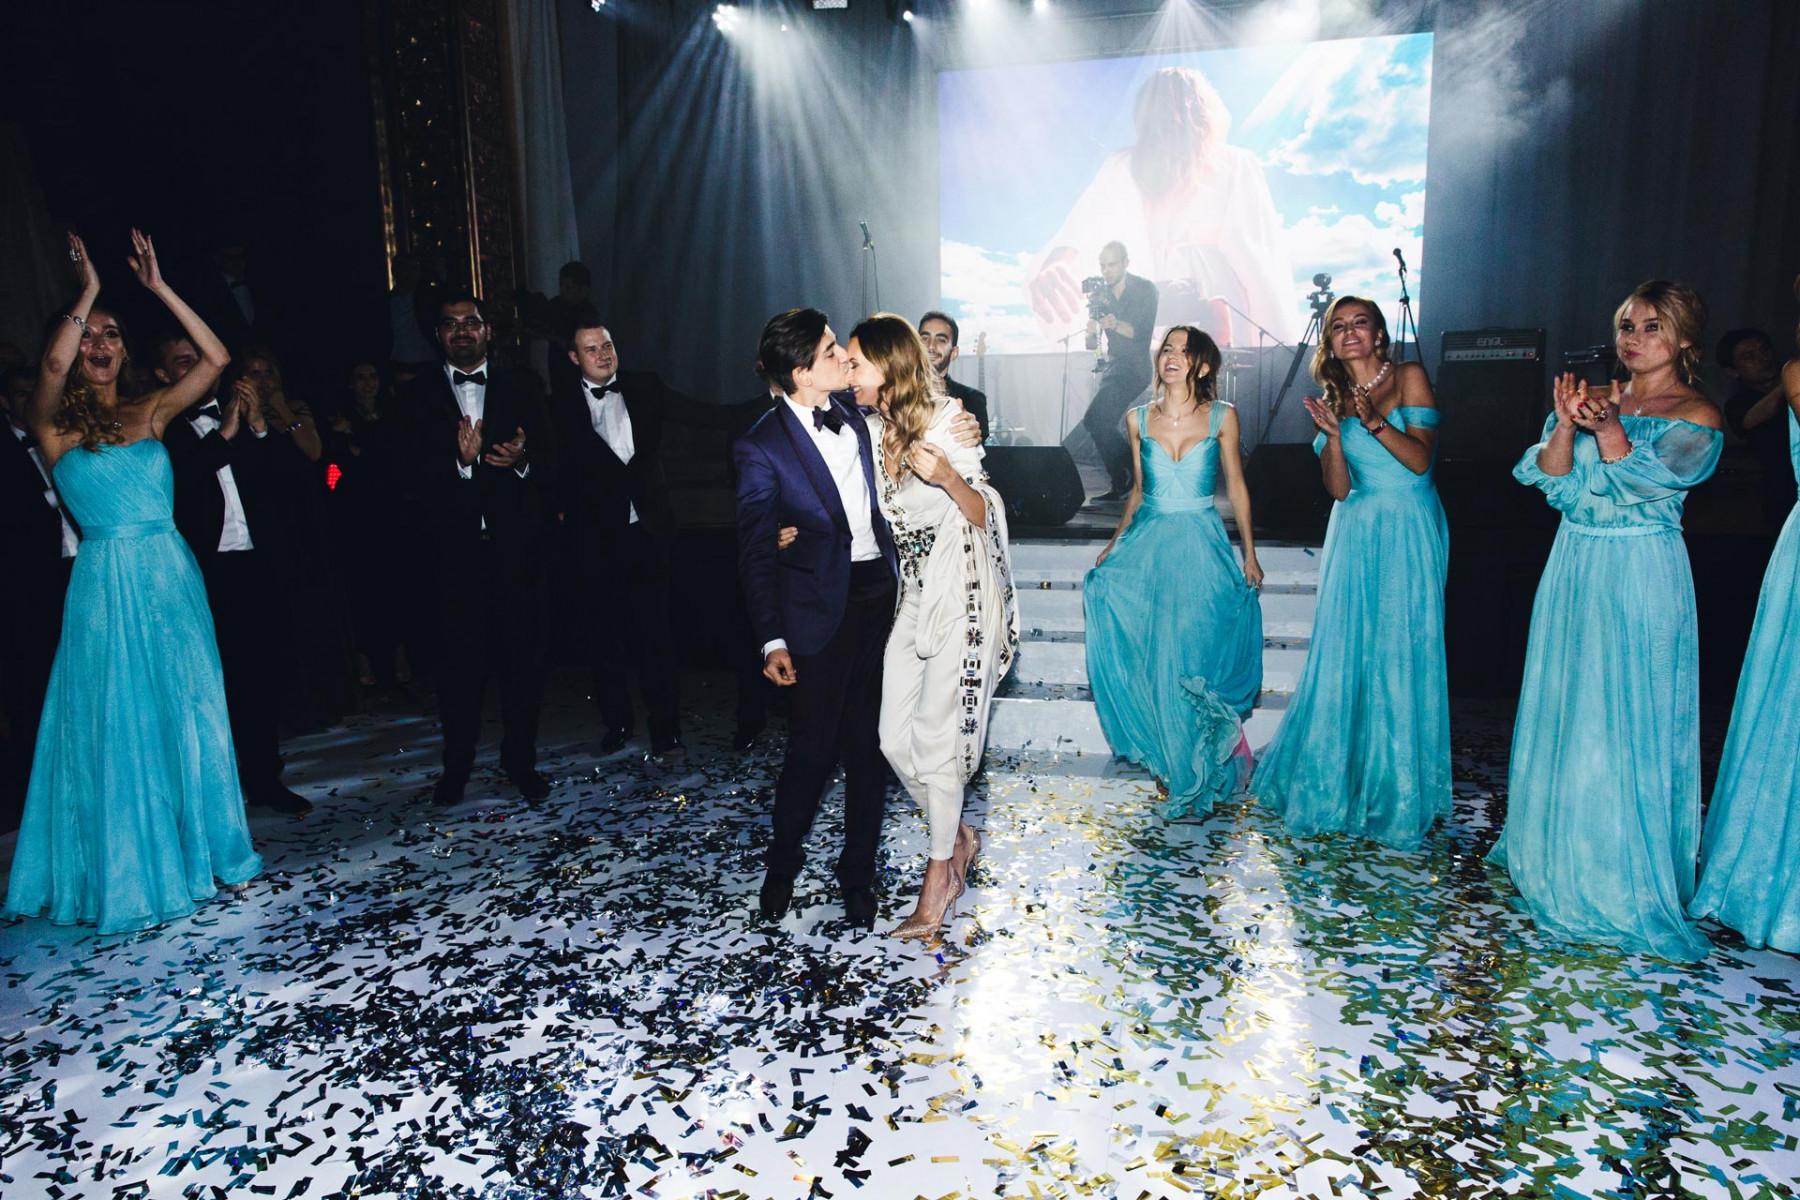 Мурад Османн и Наталья: свадьба создателей #followmeto